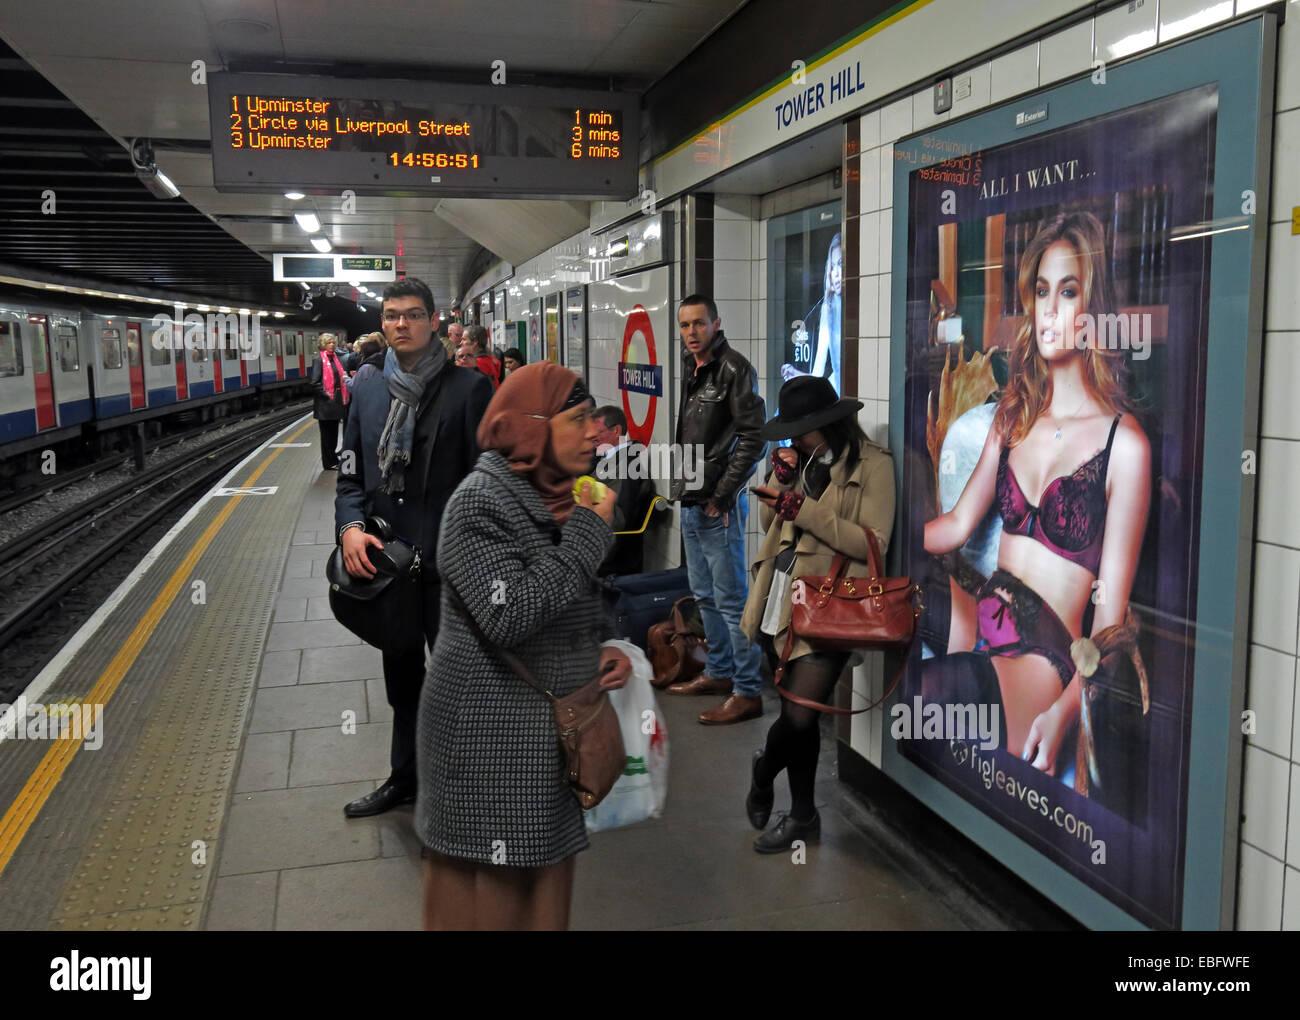 City Underground platform,England,UK,GB,Great,Britain,transport,people,looking,at,a,poster,fun,shot,LU,circle,district,line,flesh,underwear,bra,stockings,suspenders,rude,Muslim,woman,lady,culture,clash,islam,gotonysmith